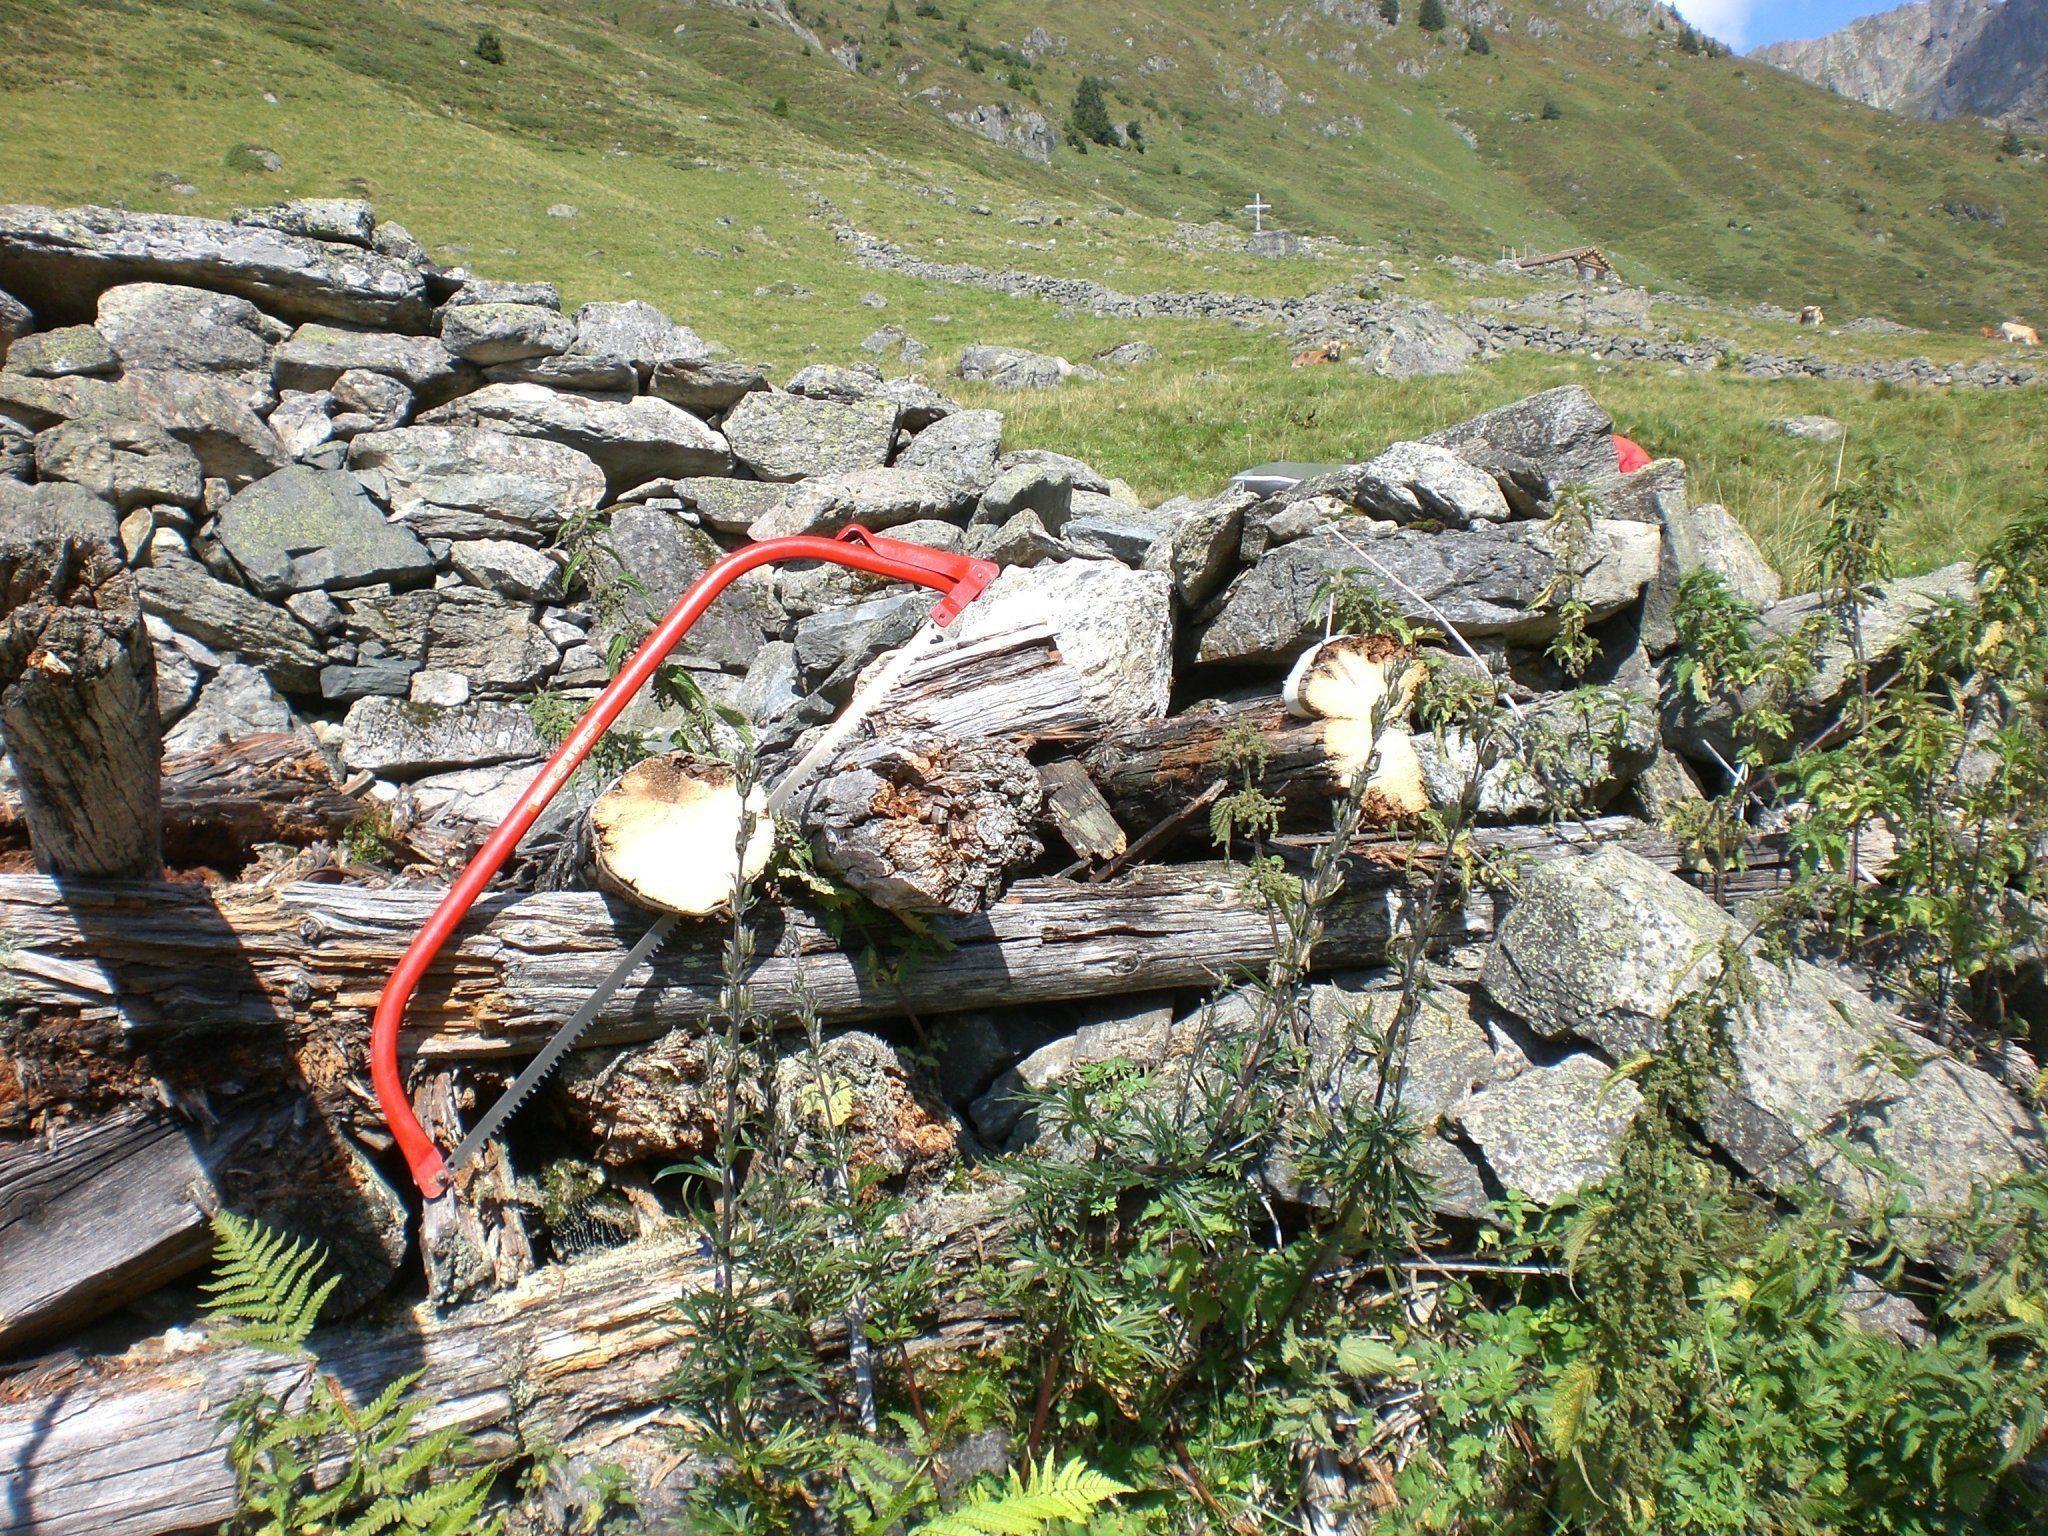 Holzreste alpiner Ruinen lassen interessante Rückschlüsse zu.